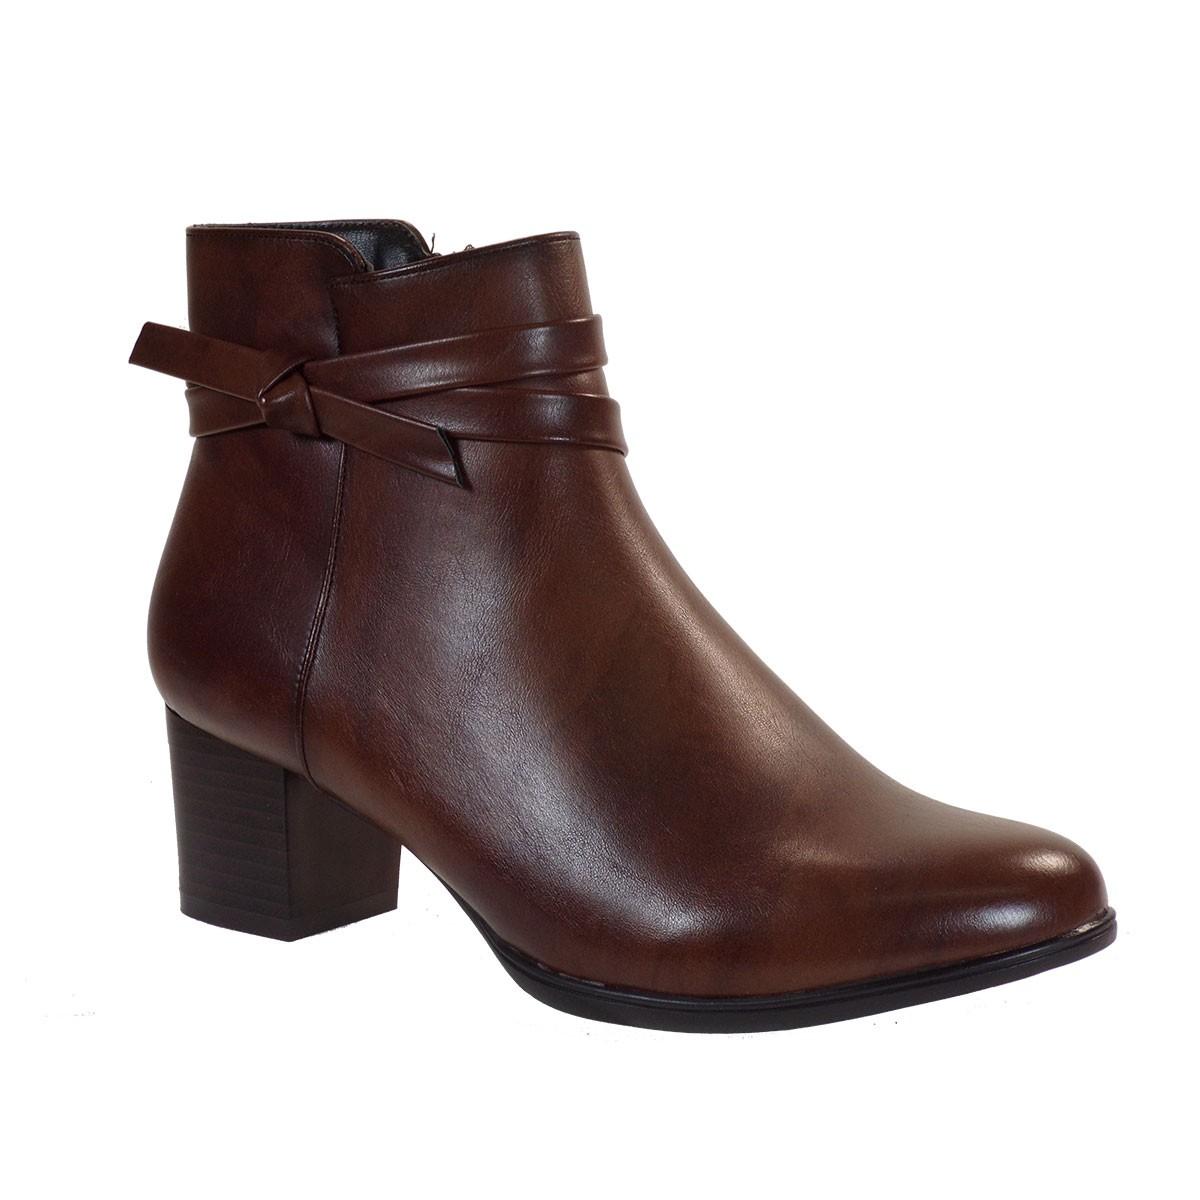 Miss NV Γυναικεία Παπούτσια Μποτάκια V89-10114-28 Καφέ